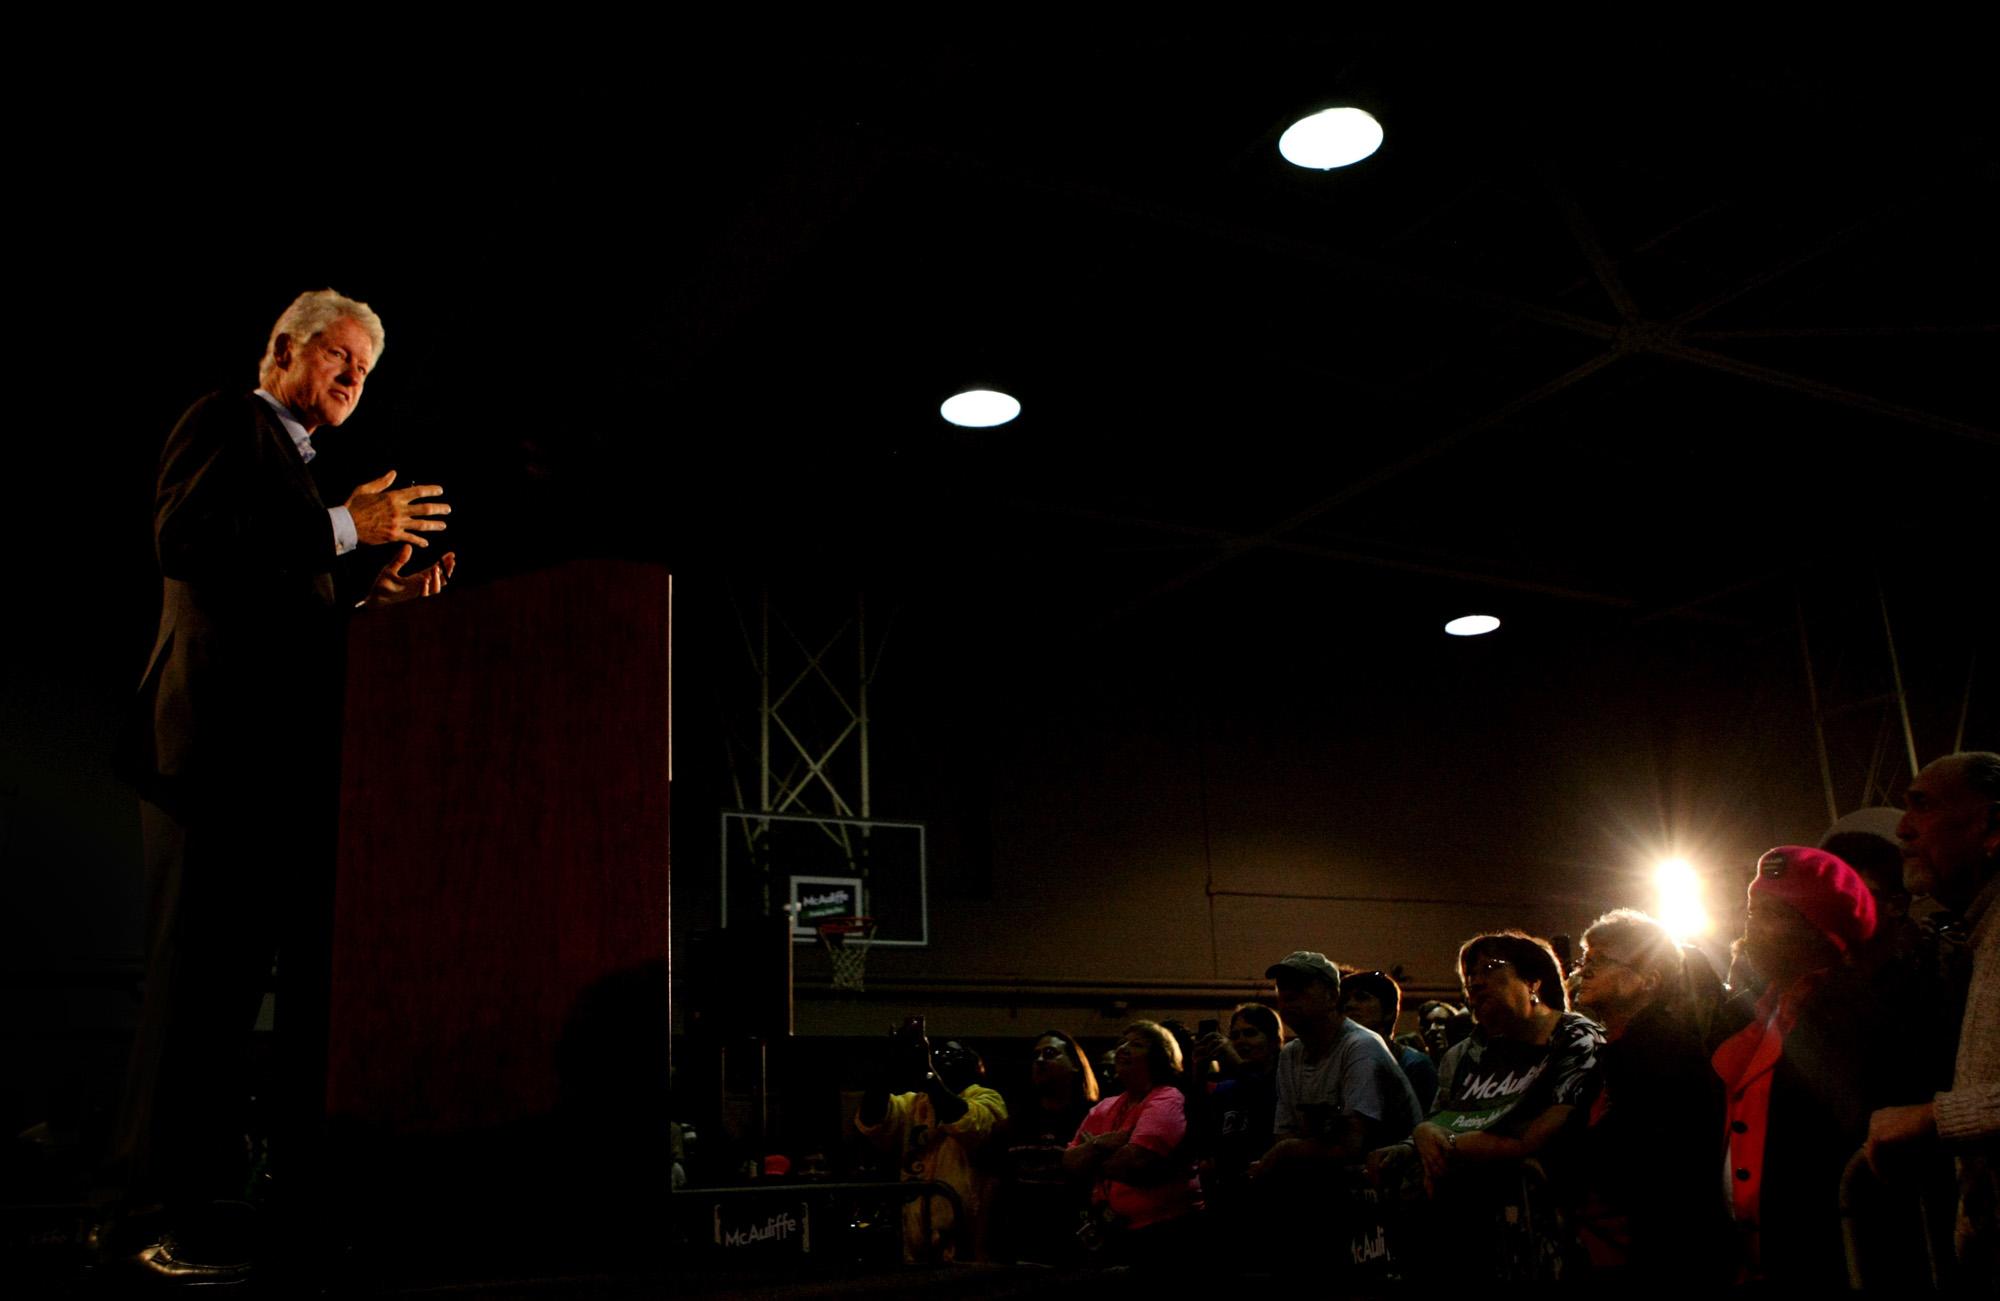 Presdient Bill Clinton stumps on behalf of current president Barack Obama.